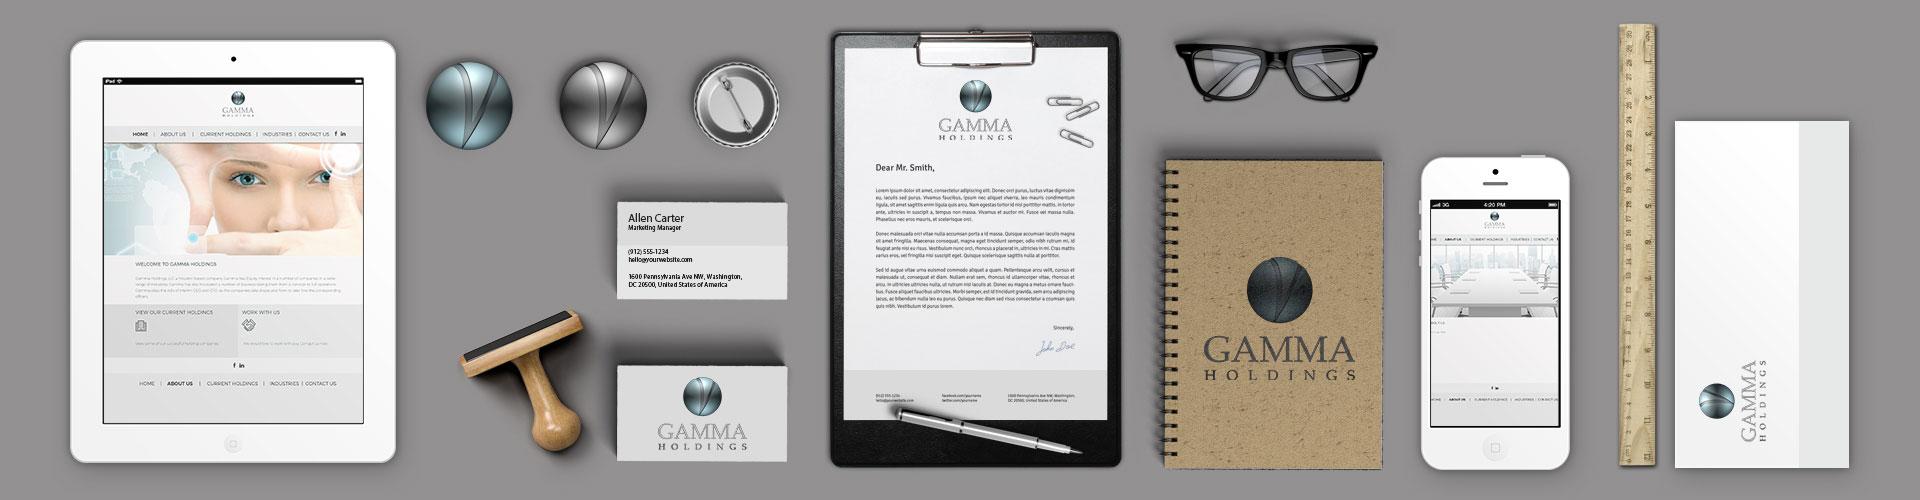 Gamma Holdings Header Image